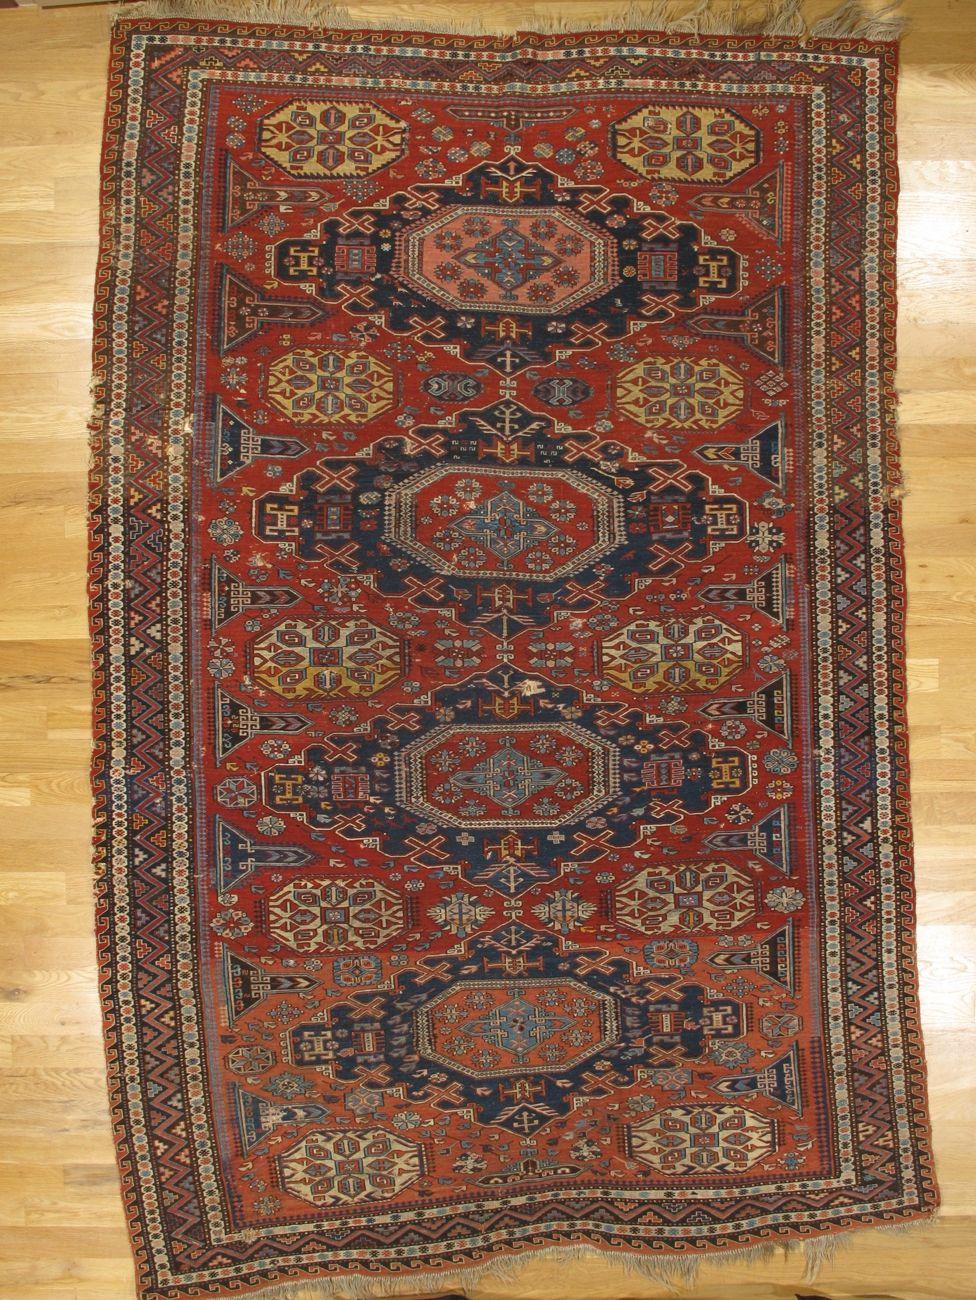 Soumak Carpet From Kuba District Eastern Caucasus West Coast Of The Caspian Sea Age Circa 1890 Size 10 6 X6 8 320x203 Cm Rugs Fluffy Rug Persian Rug